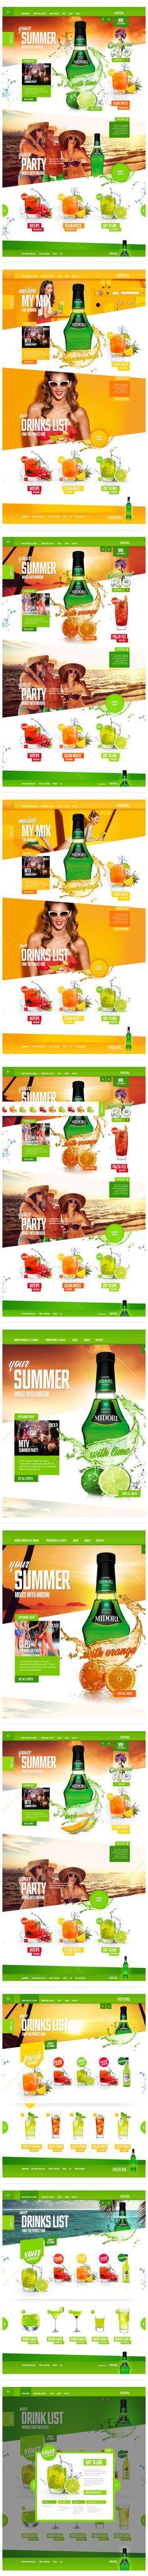 Midori - Website redesign by Garth Sykes, via Behance